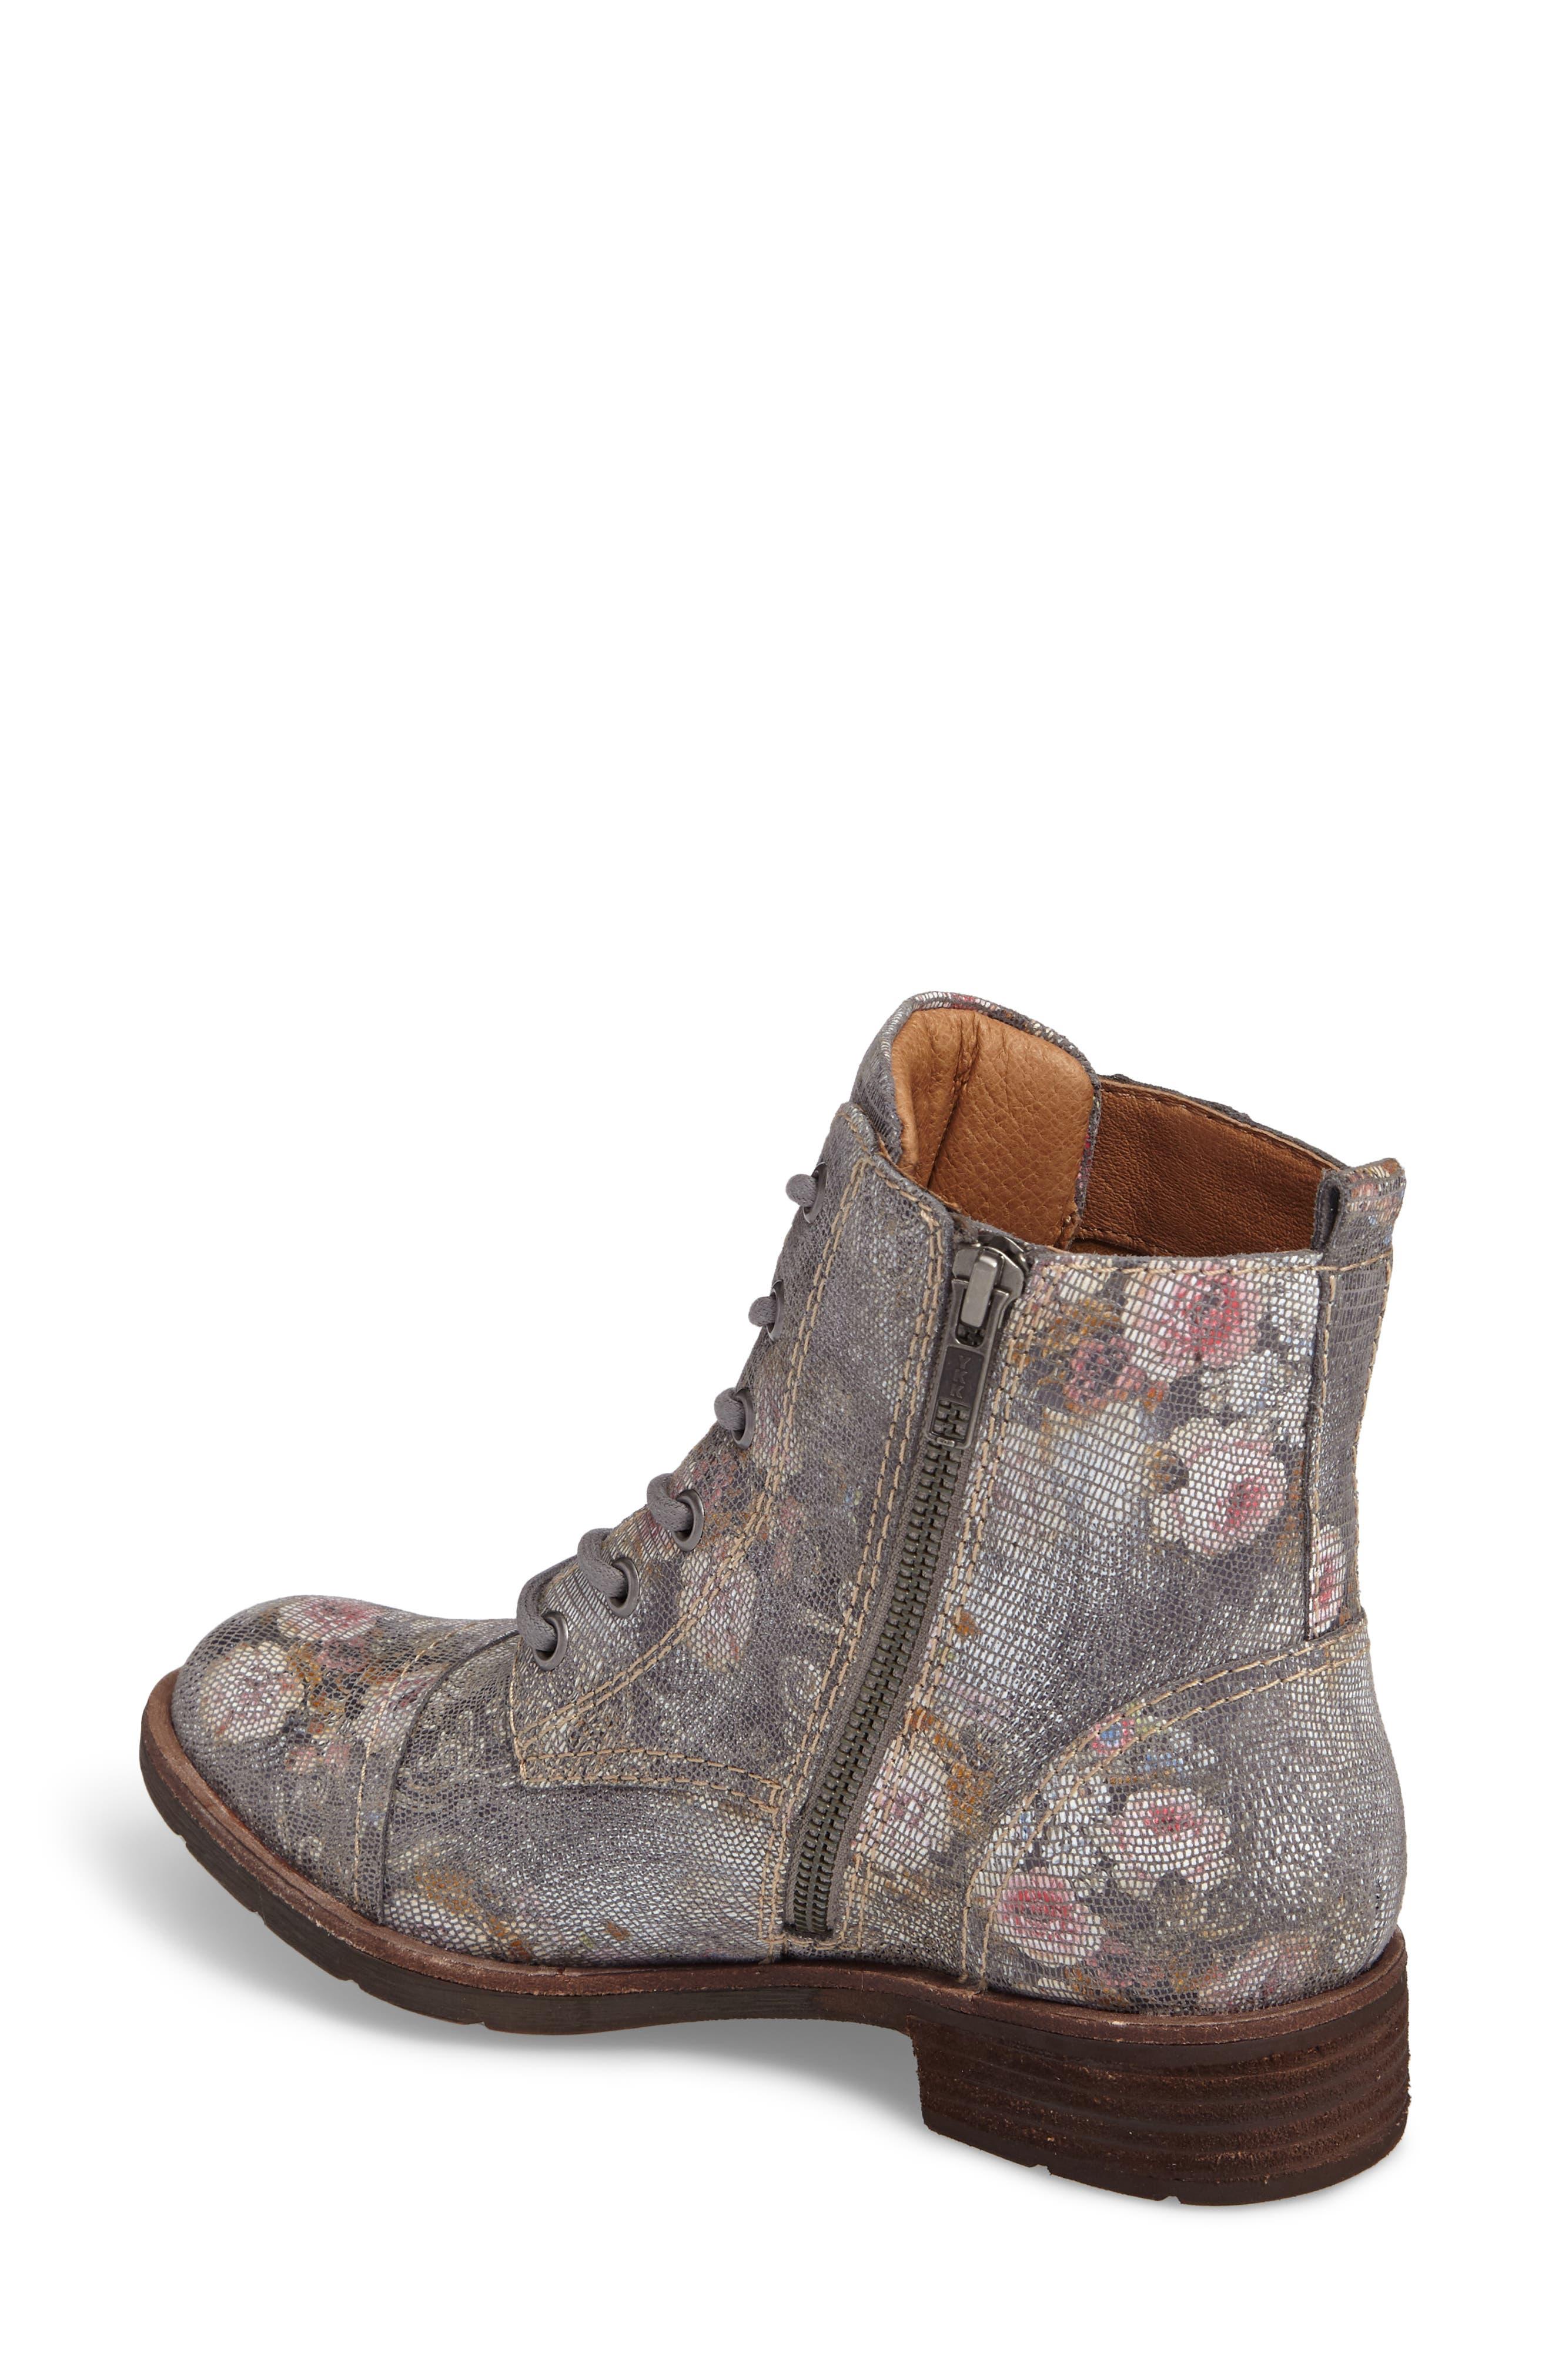 Belton Cap Toe Combat Boot,                             Alternate thumbnail 2, color,                             Grey Leather